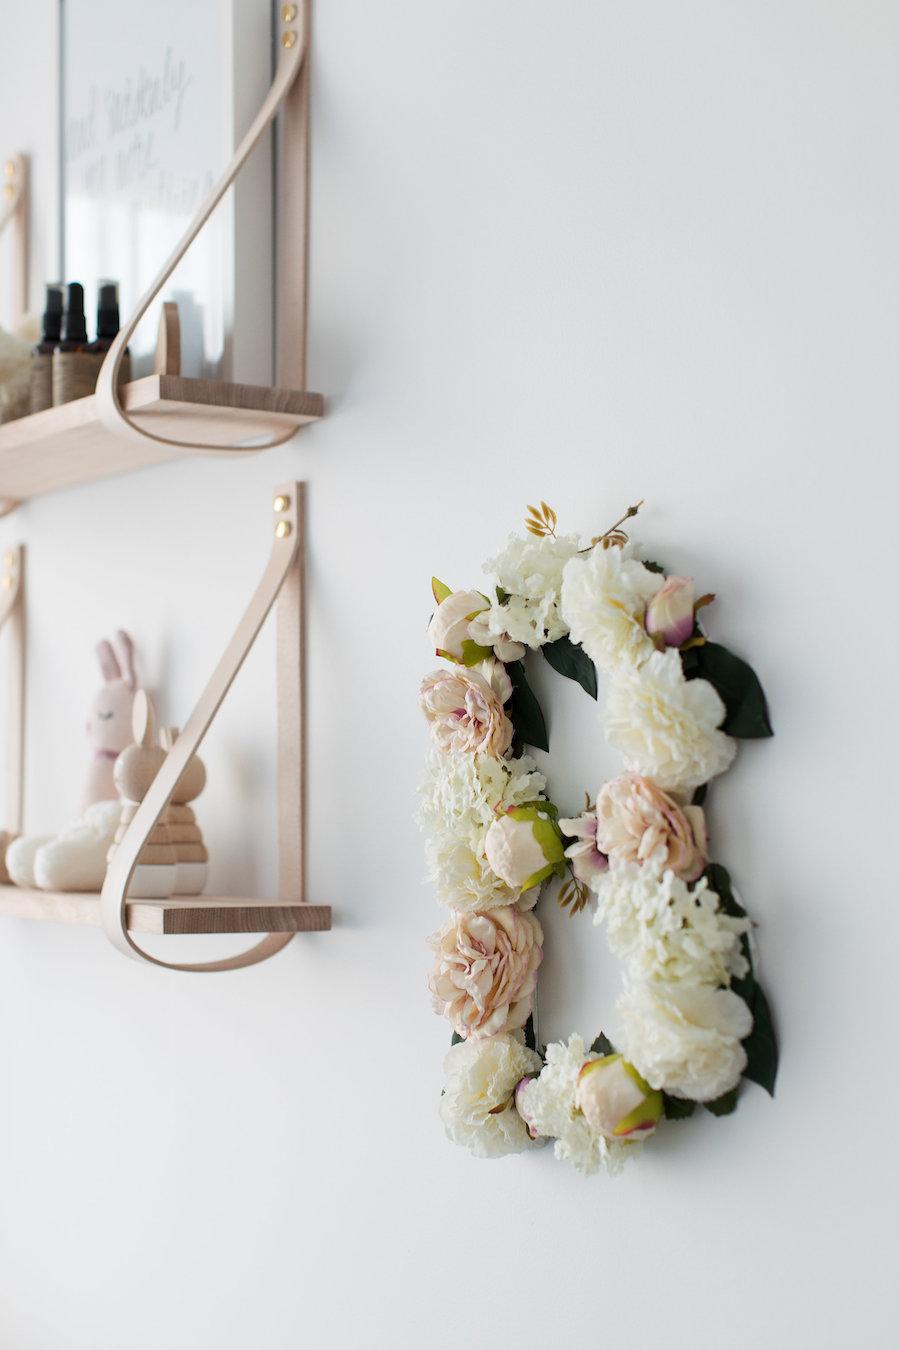 Completed floral monogram